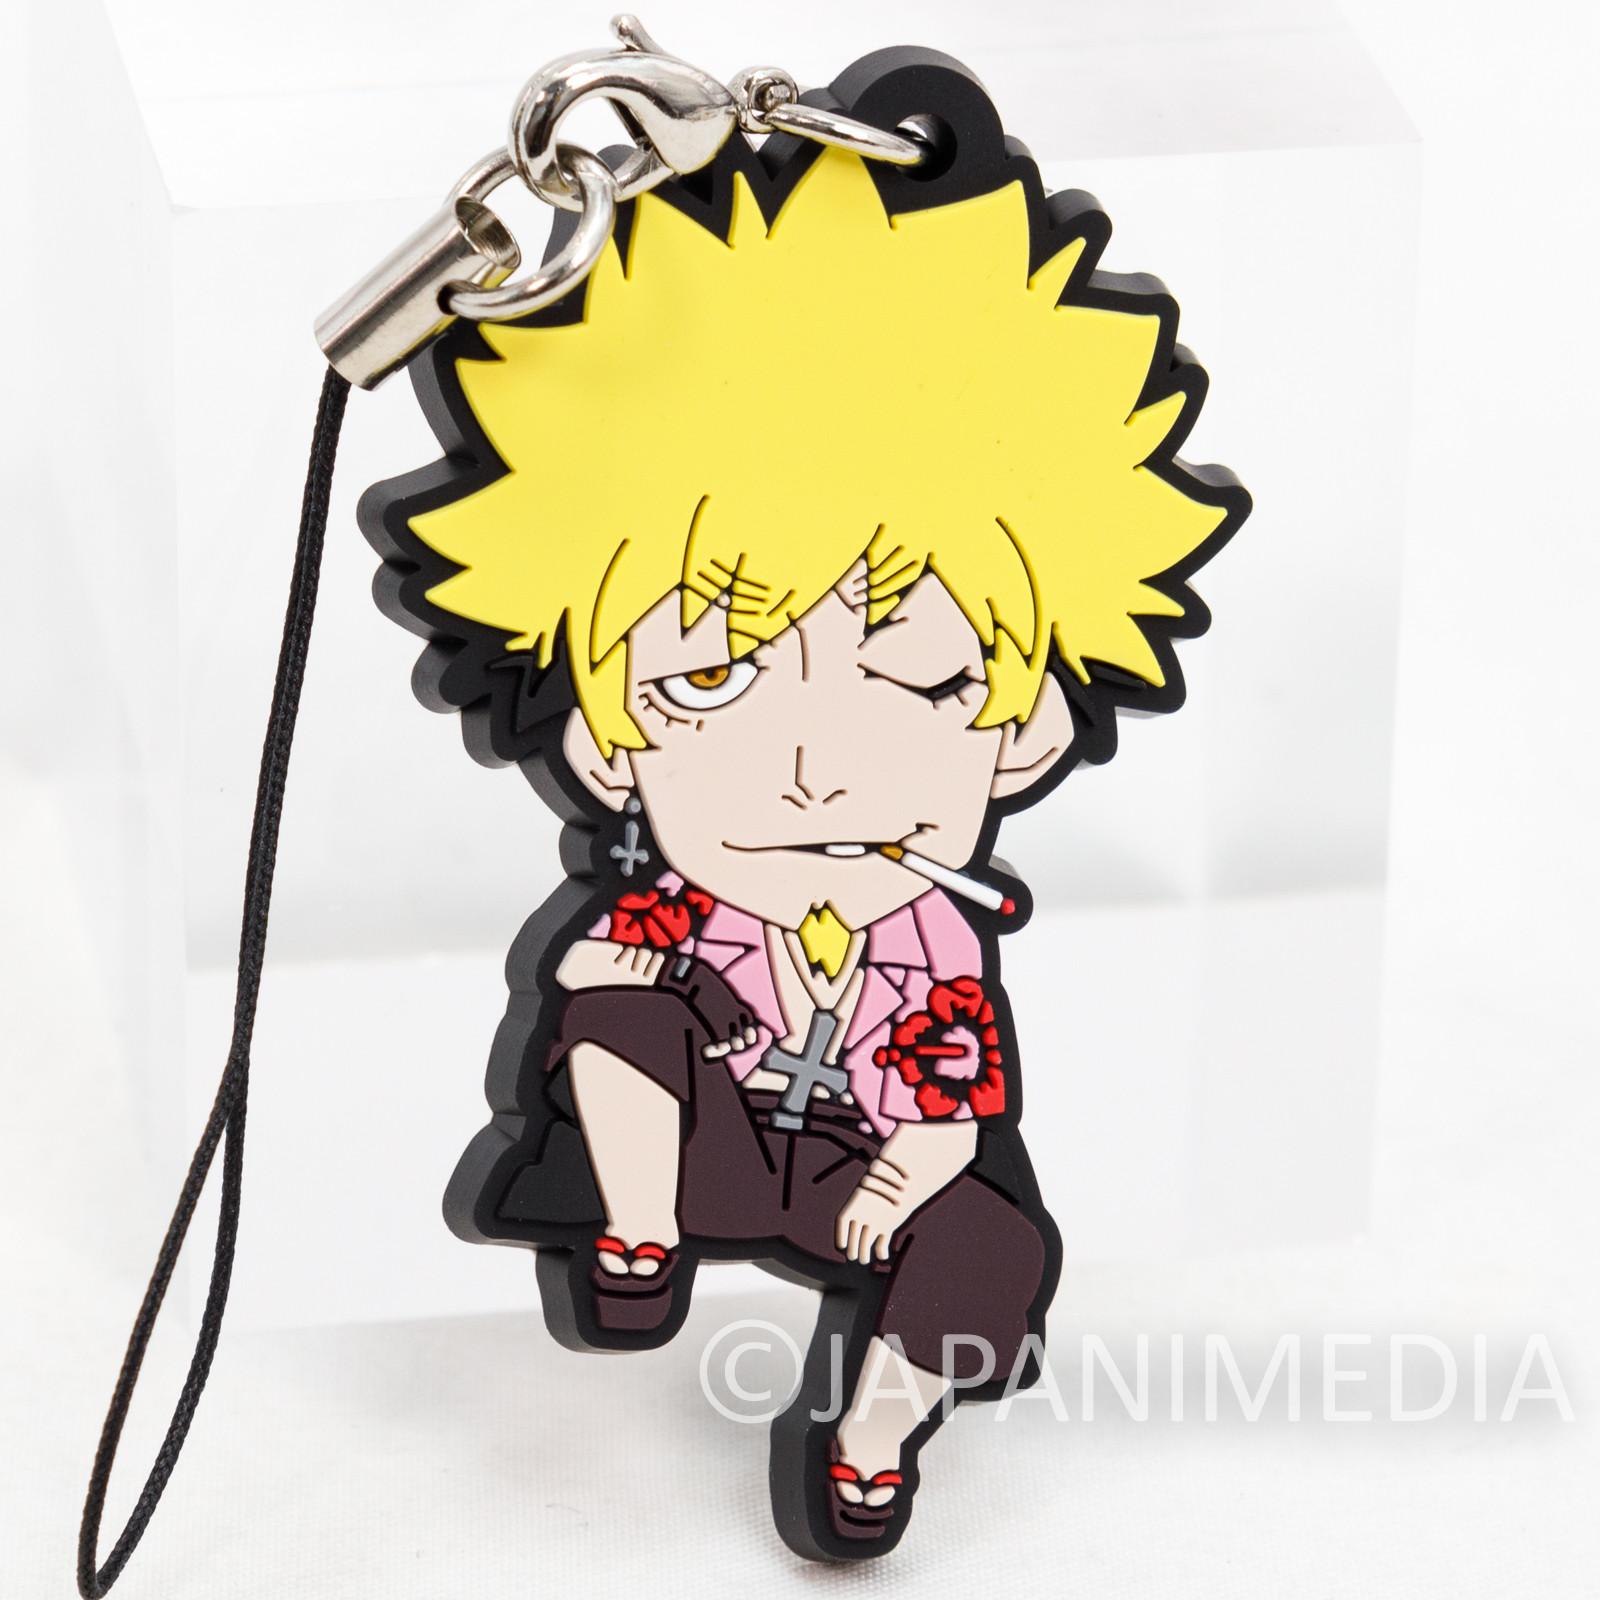 Bakemonogatari Meme Oshino Rubber Mascot Strap JAPAN ANIME Monogatari (series)